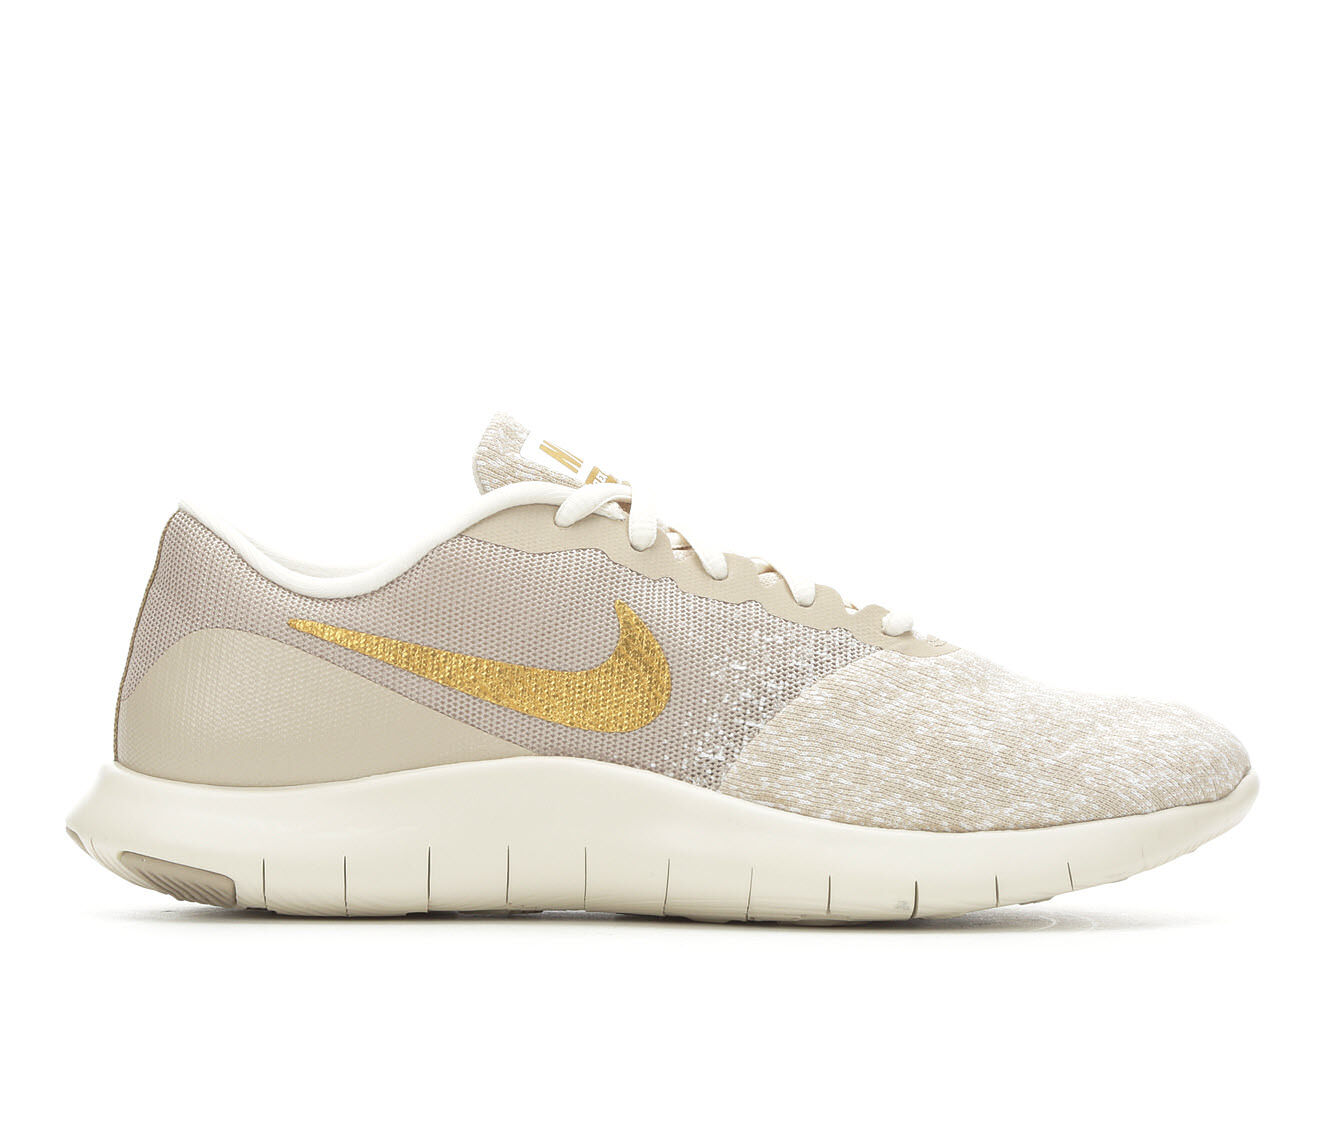 uk shoes_kd4441